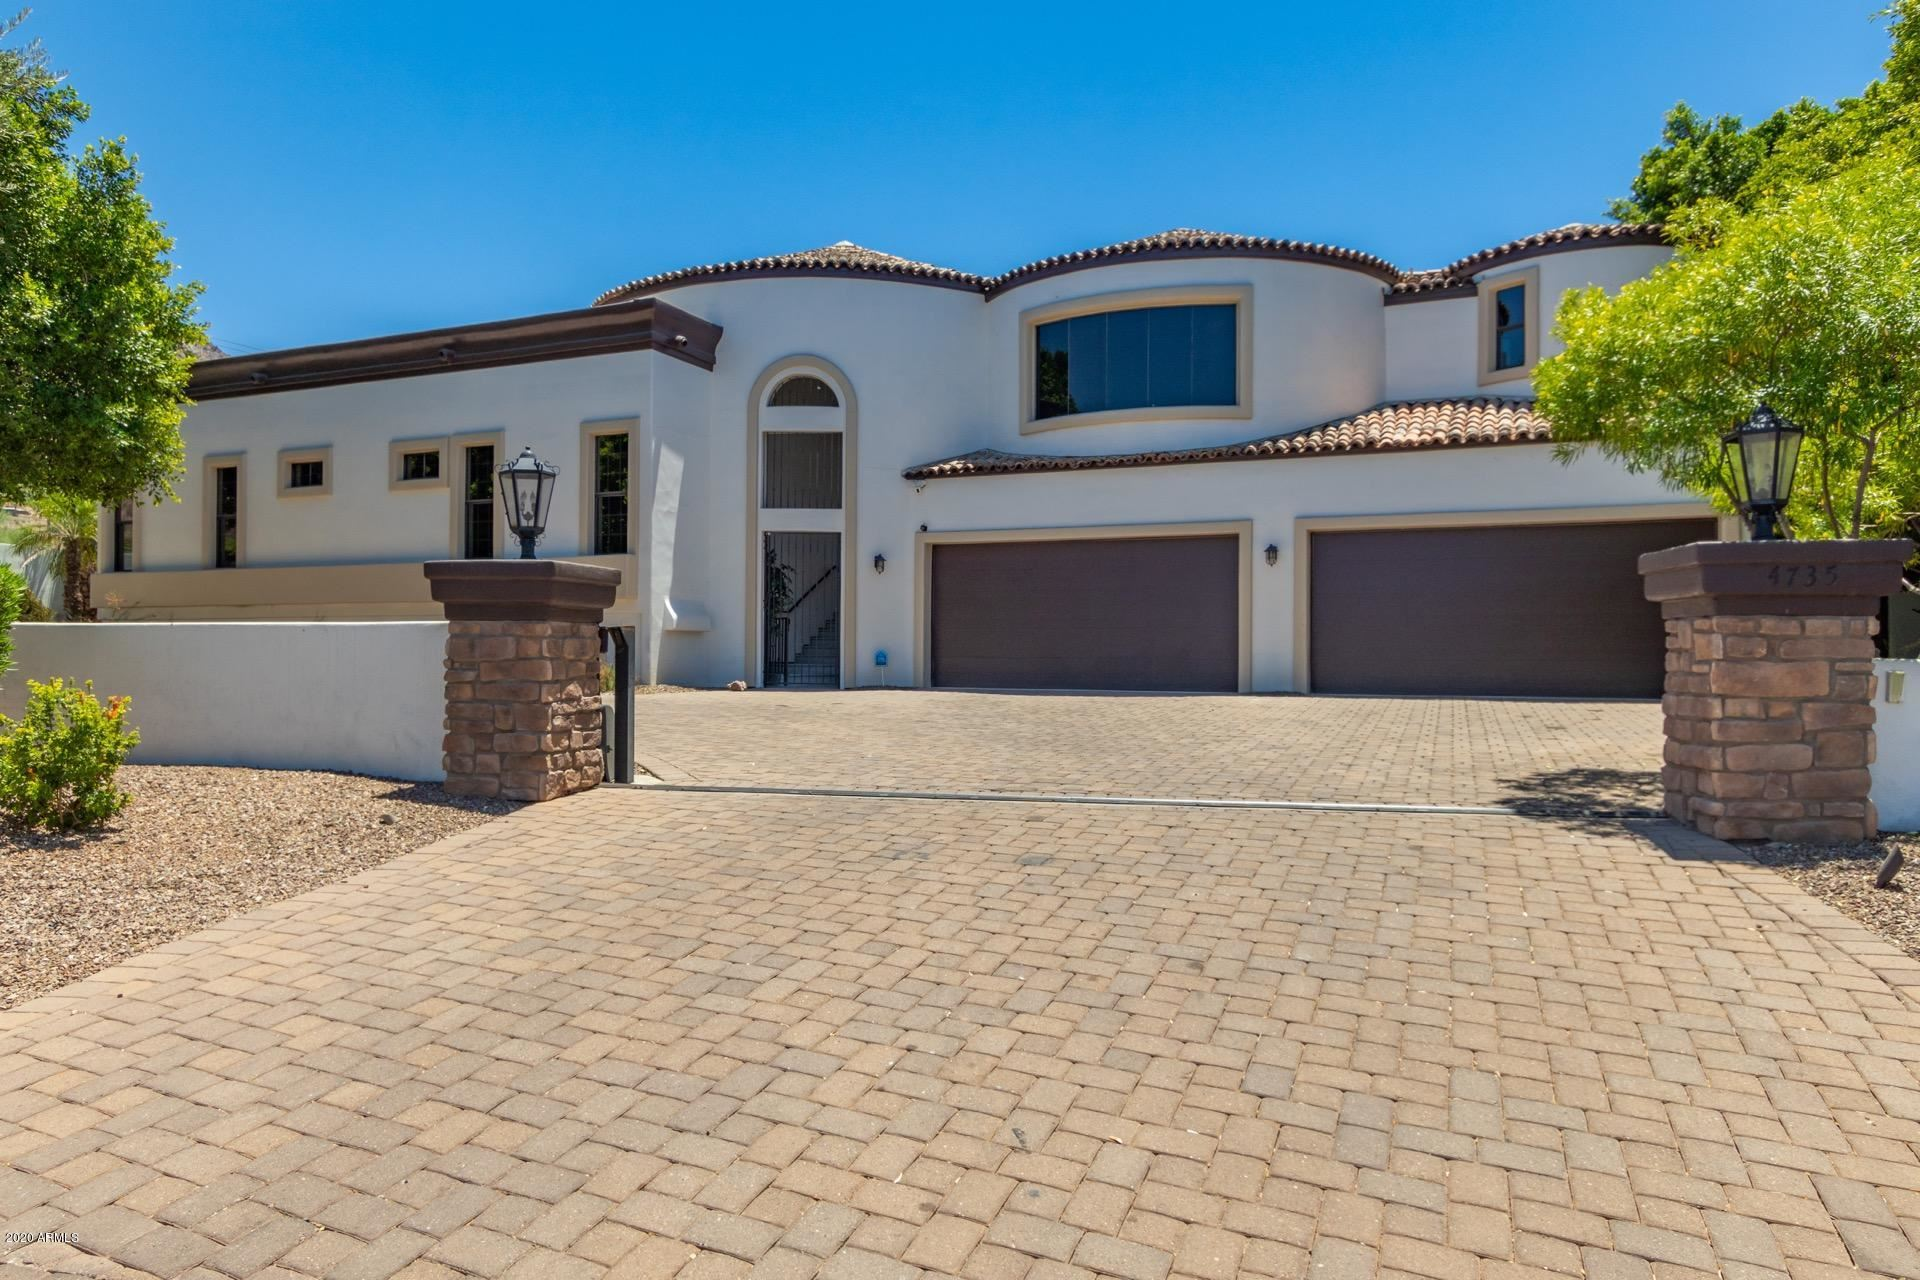 4735 N LAUNFAL Avenue, Phoenix, AZ 85018 - #: 6215983